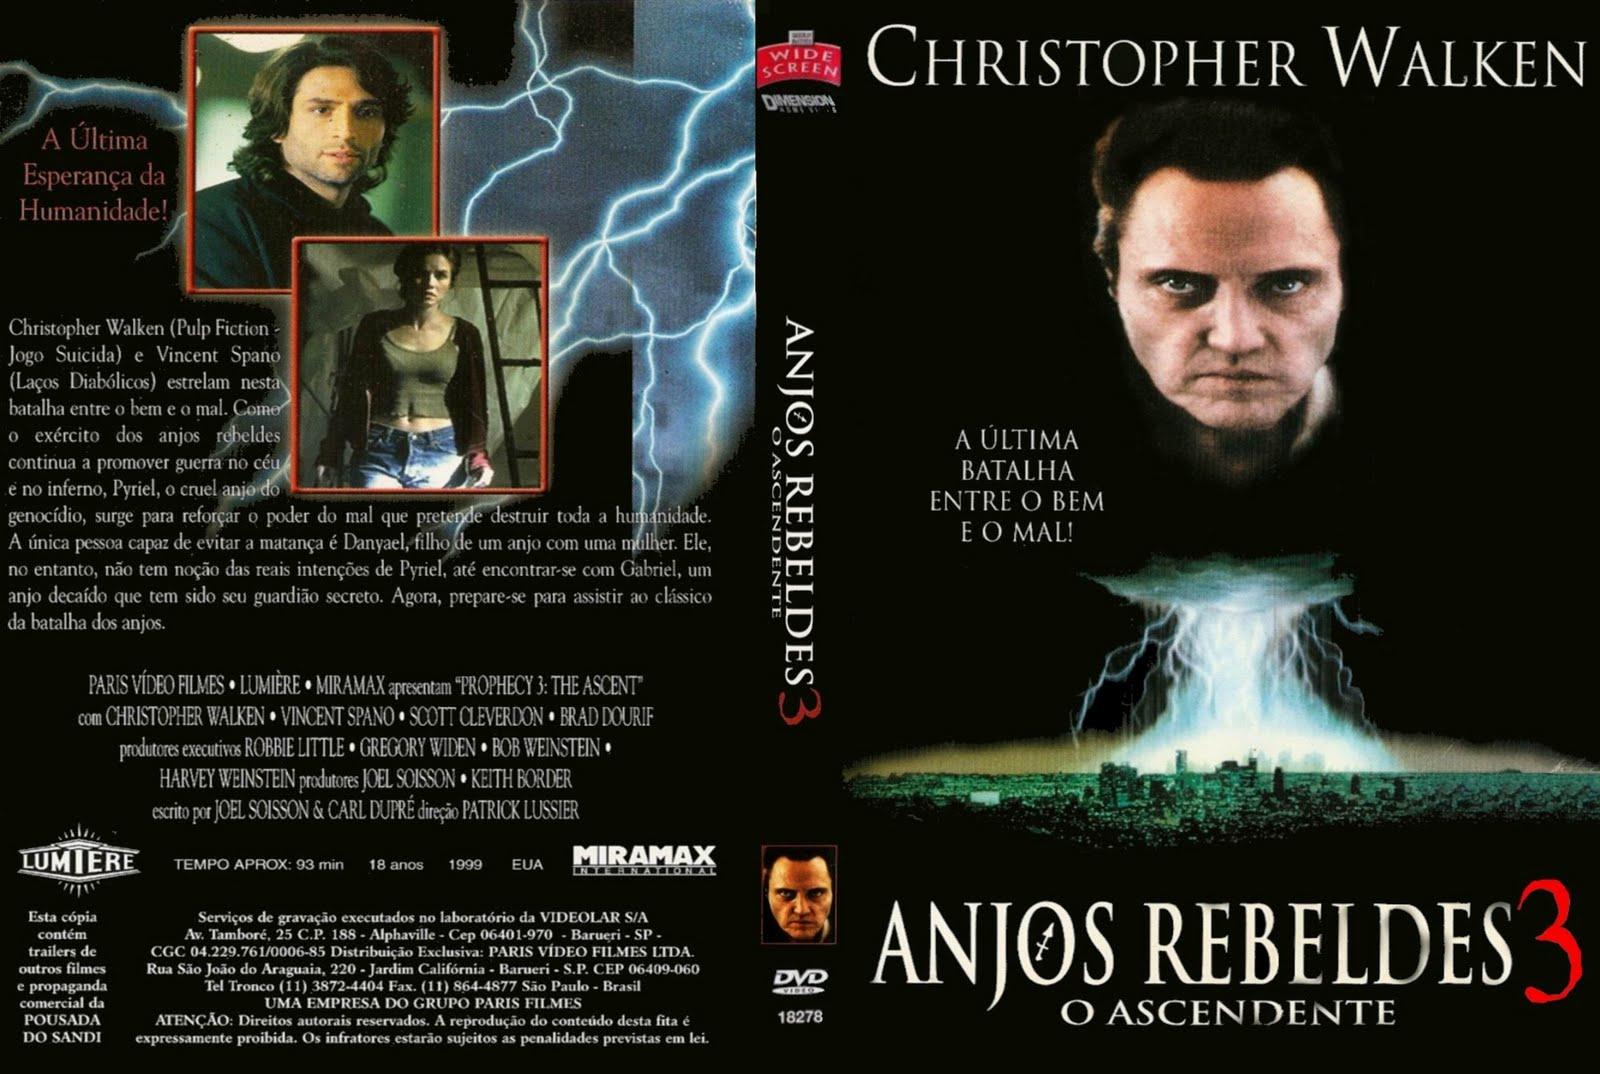 http://4.bp.blogspot.com/_56N_enXK-4o/TRnGZ2MRrHI/AAAAAAAAAZs/JQibvlZn89Y/s1600/Anjos-Rebeldes-3.jpg